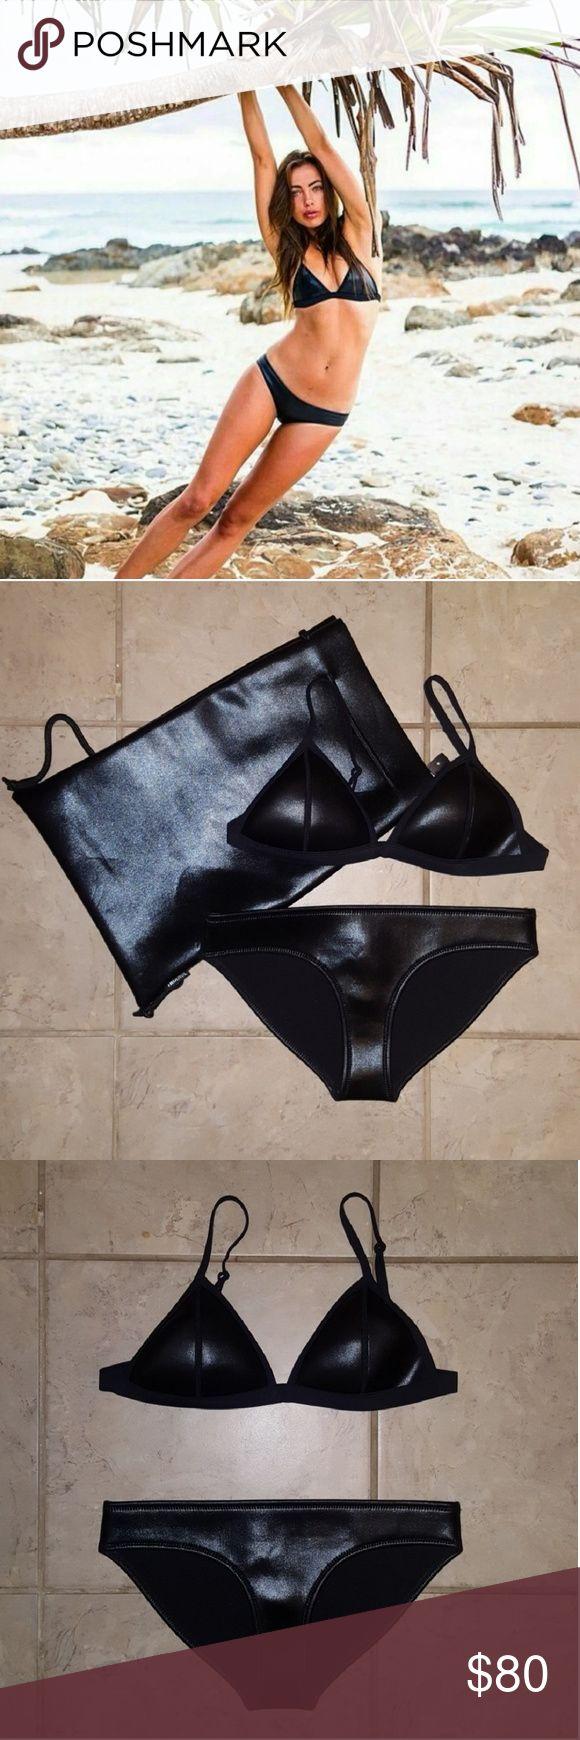 Selling this Triangl Twiggy Stardust bikini s on Poshmark! My username is: rl27. #shopmycloset #poshmark #fashion #shopping #style #forsale #triangl swimwear #Other